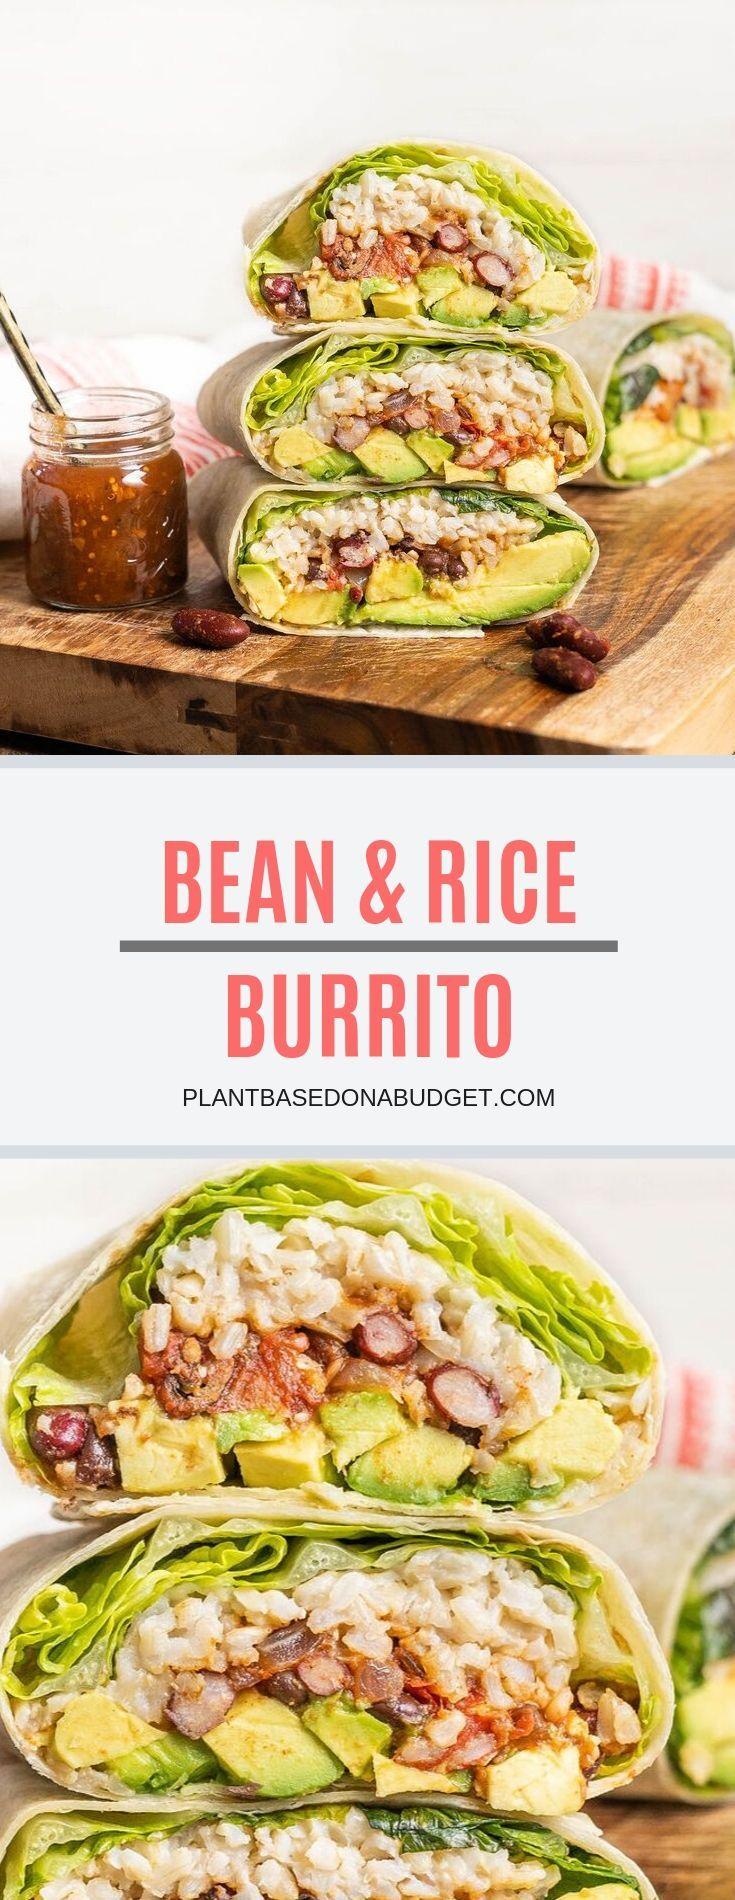 Photo of Bean and rice burrito. #vegan #veganrecipes #healthy #vegetarian #plantbased